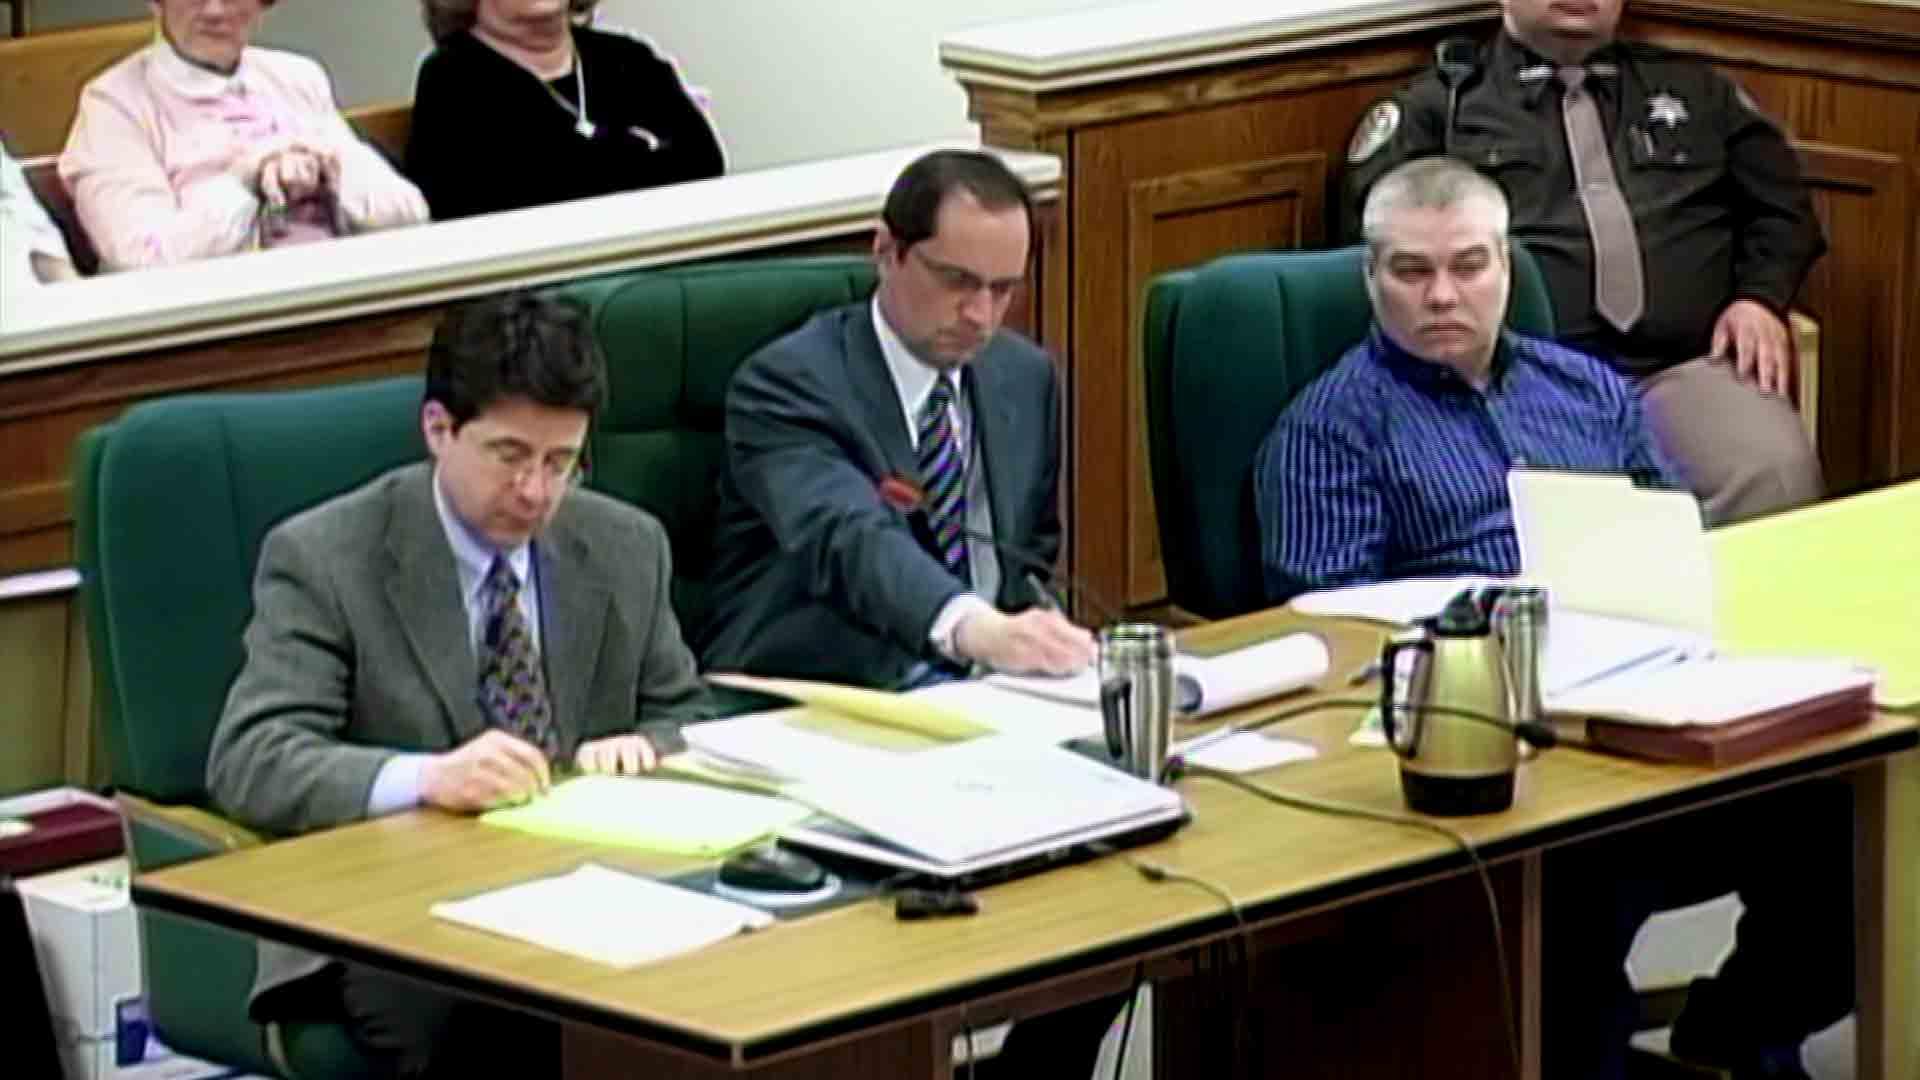 Dean Strang, Jerry Buting and Steven Avery Making a Murderer